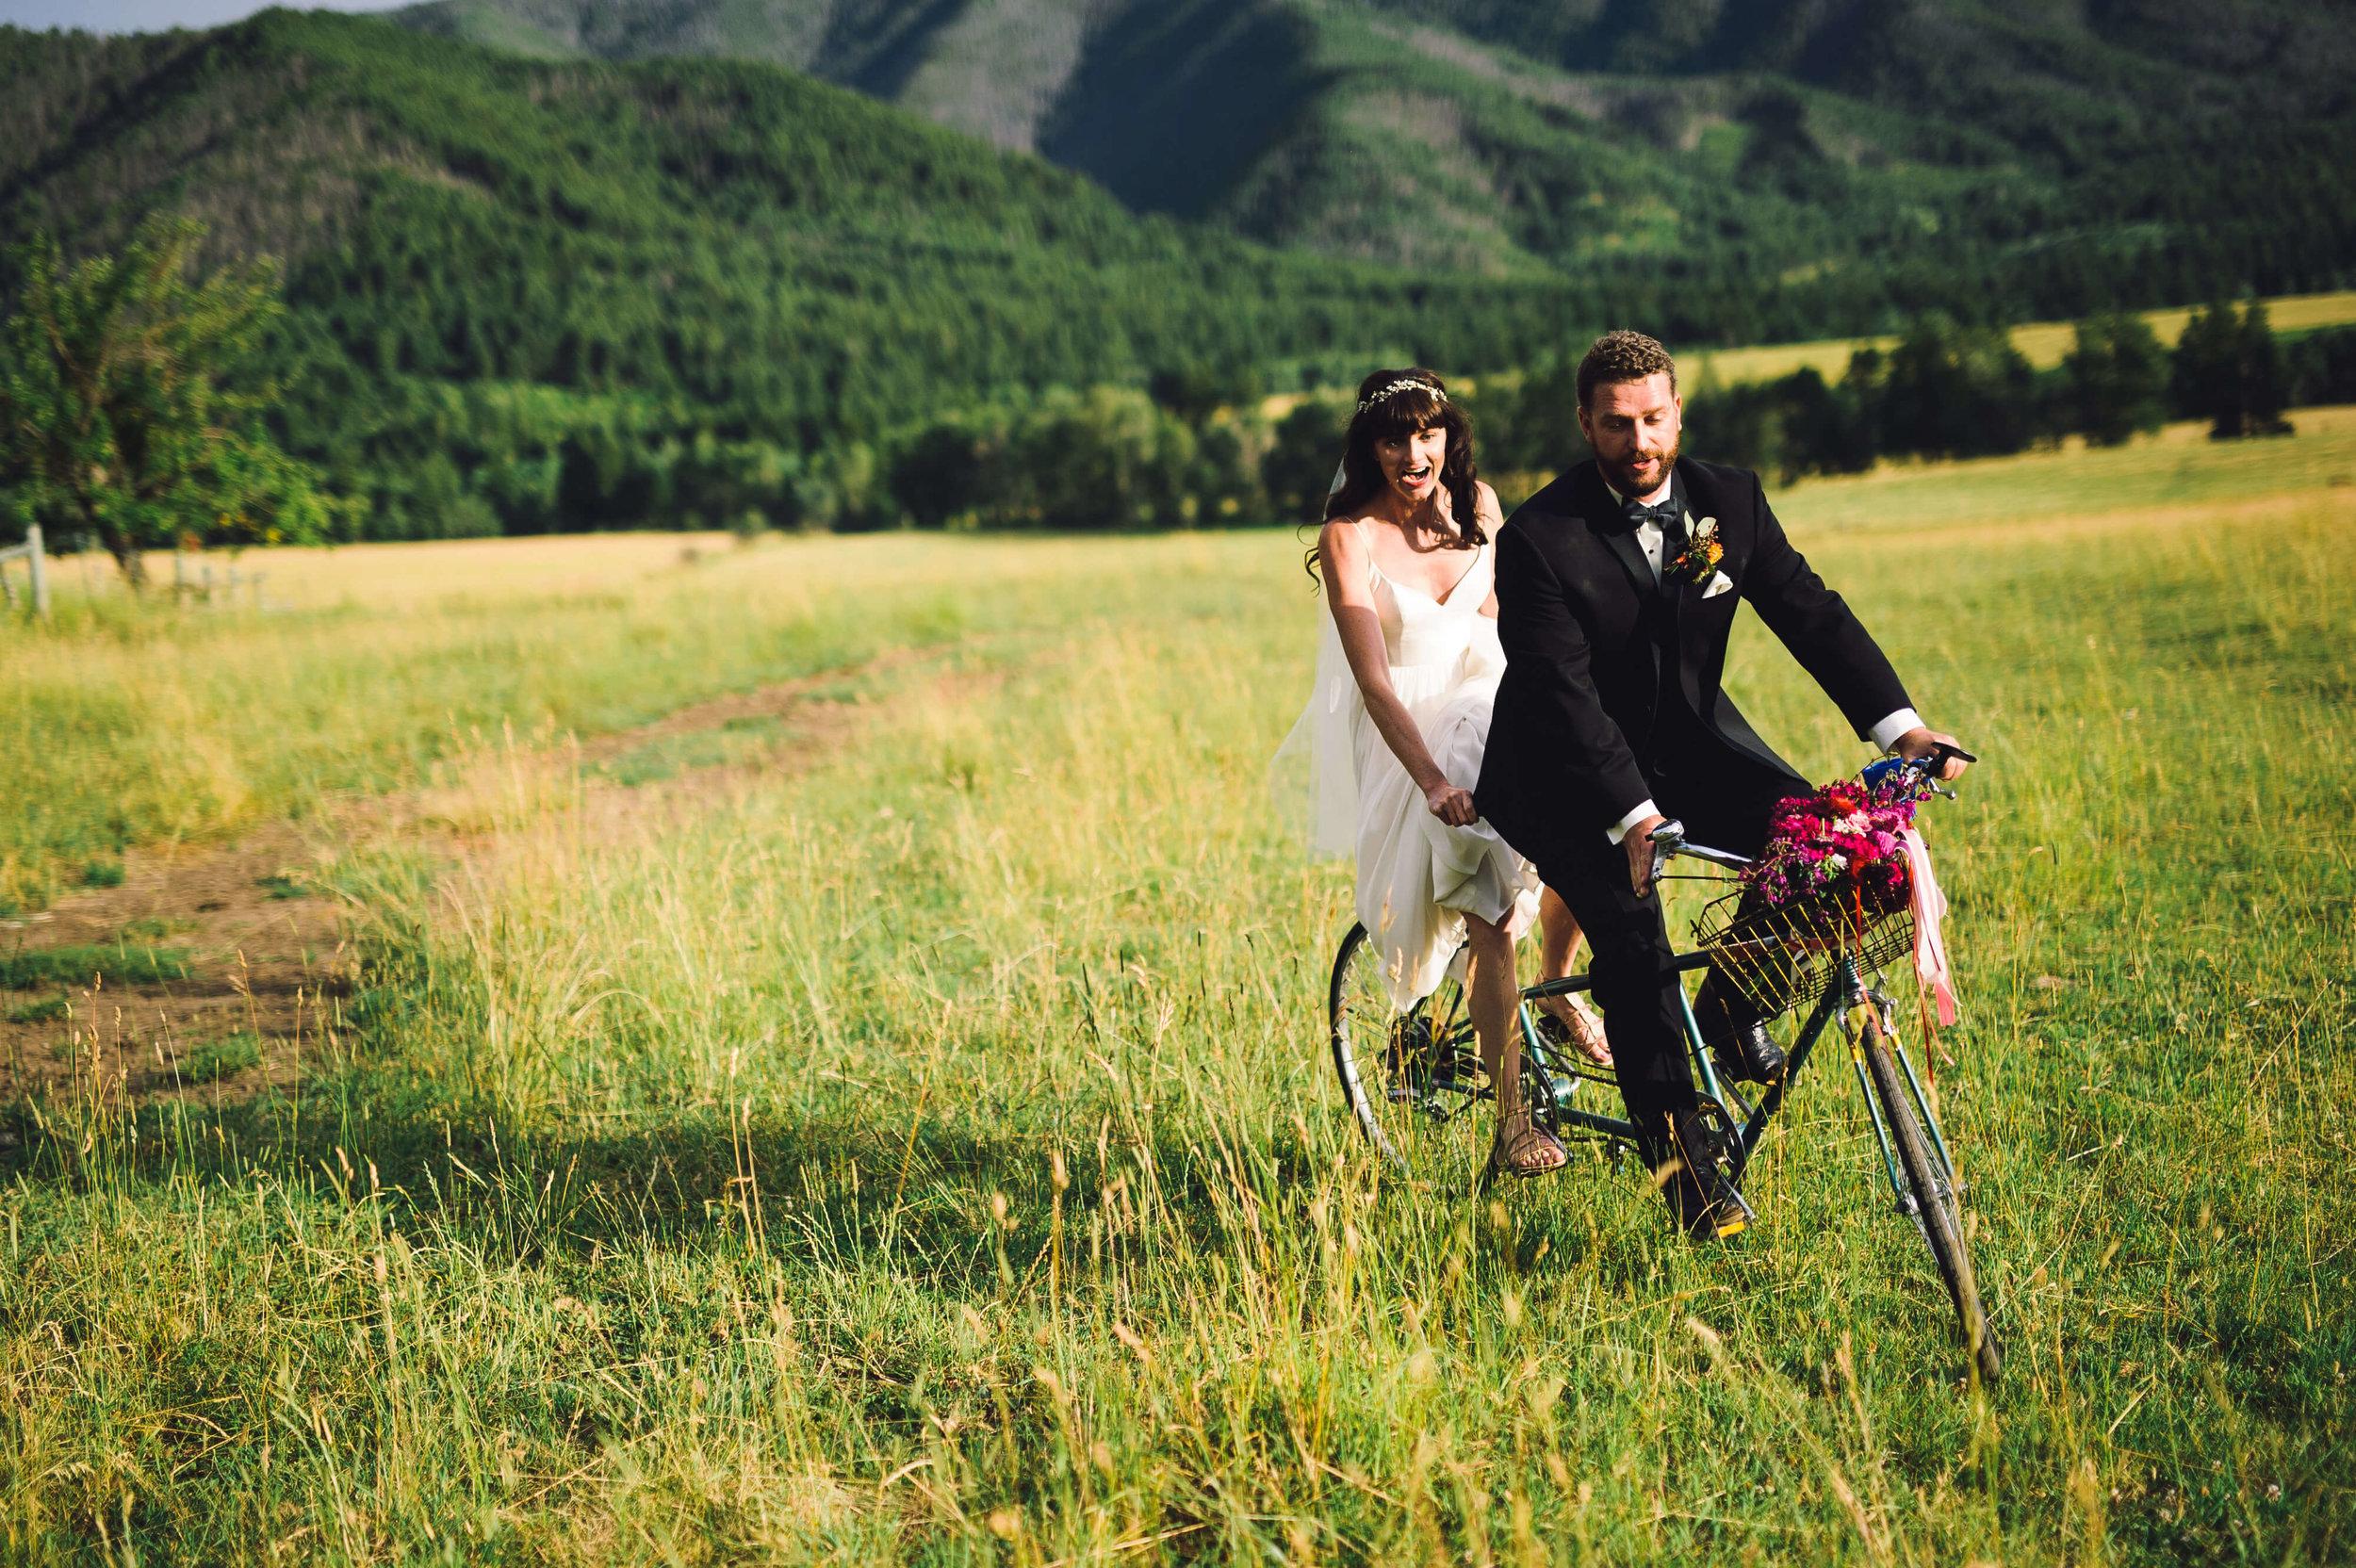 engle-olson-fran-ze-photo-montana-wedding-101.jpg